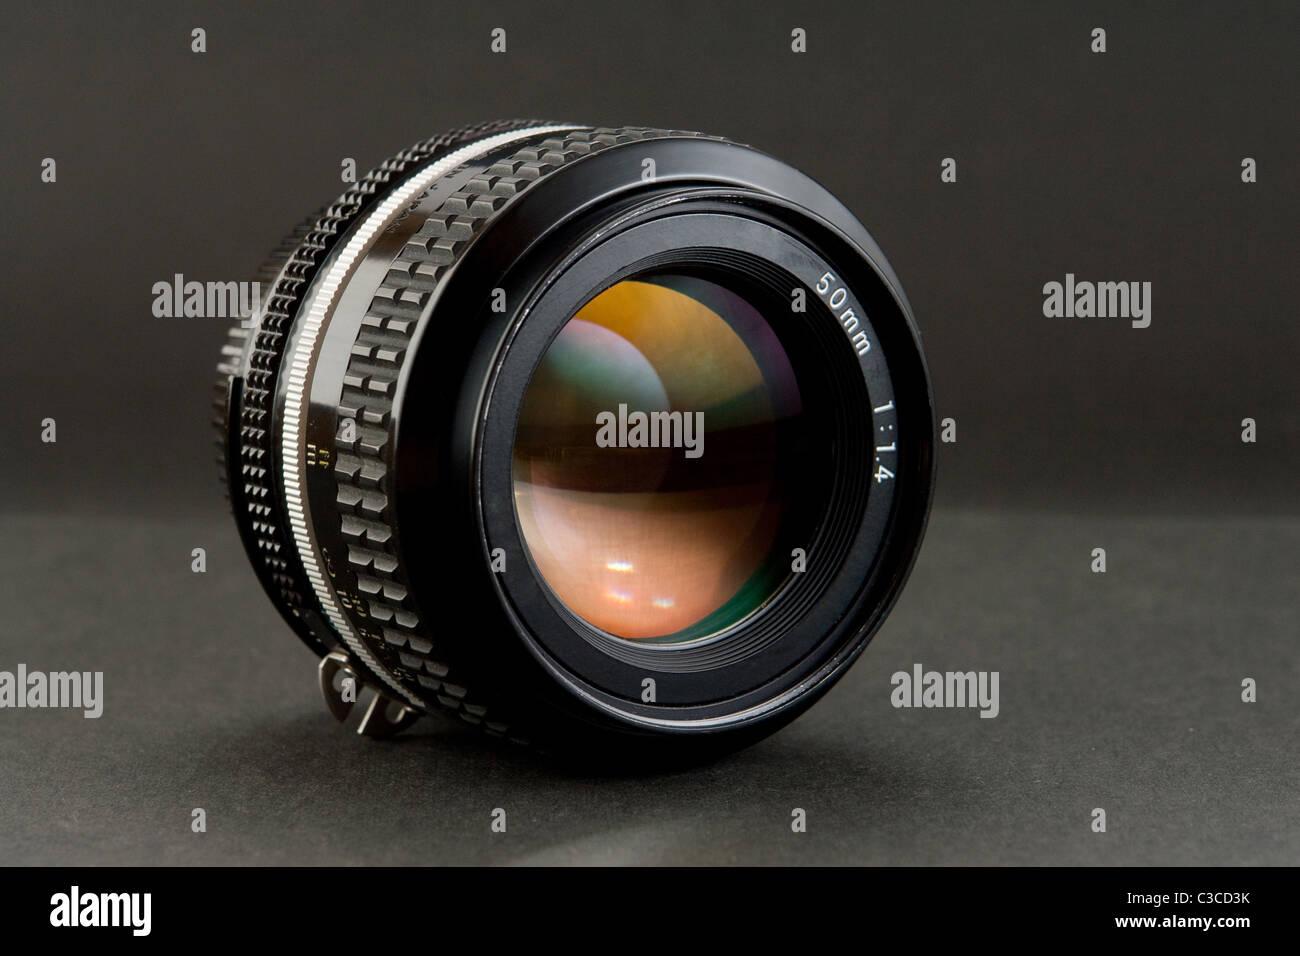 50mm Professional Grade High Quality Standard Prime Lens - Stock Image